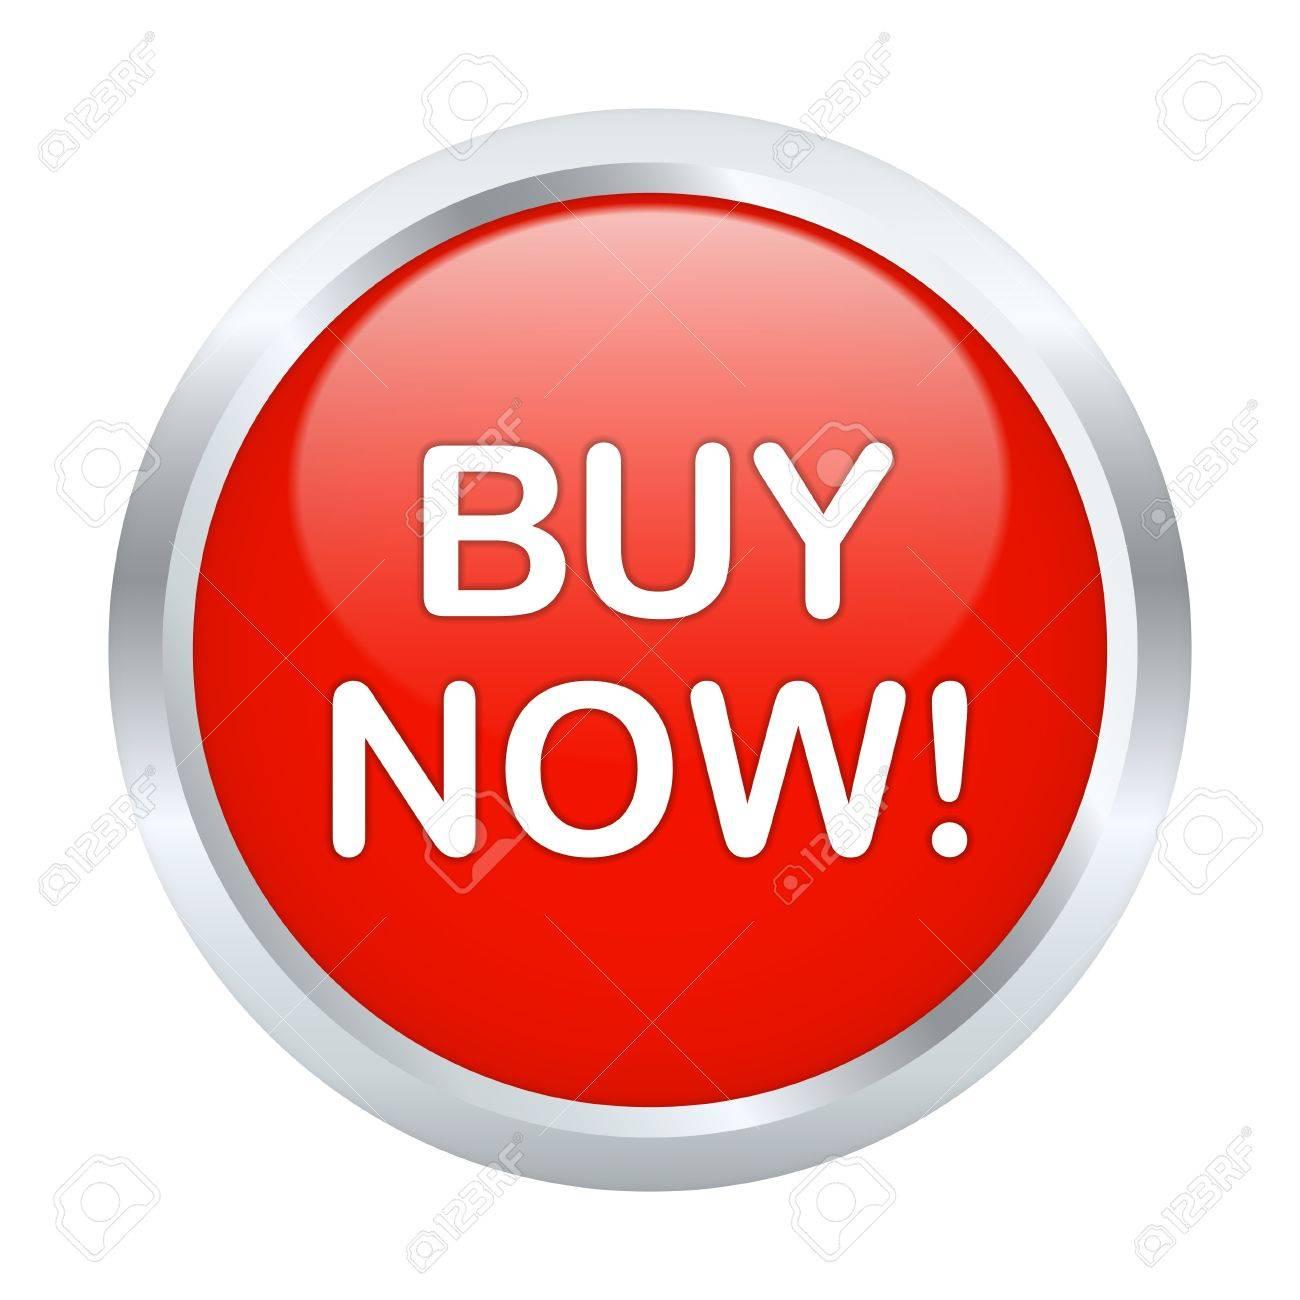 Buy now button. Vector illustration Stock Vector - 13842156